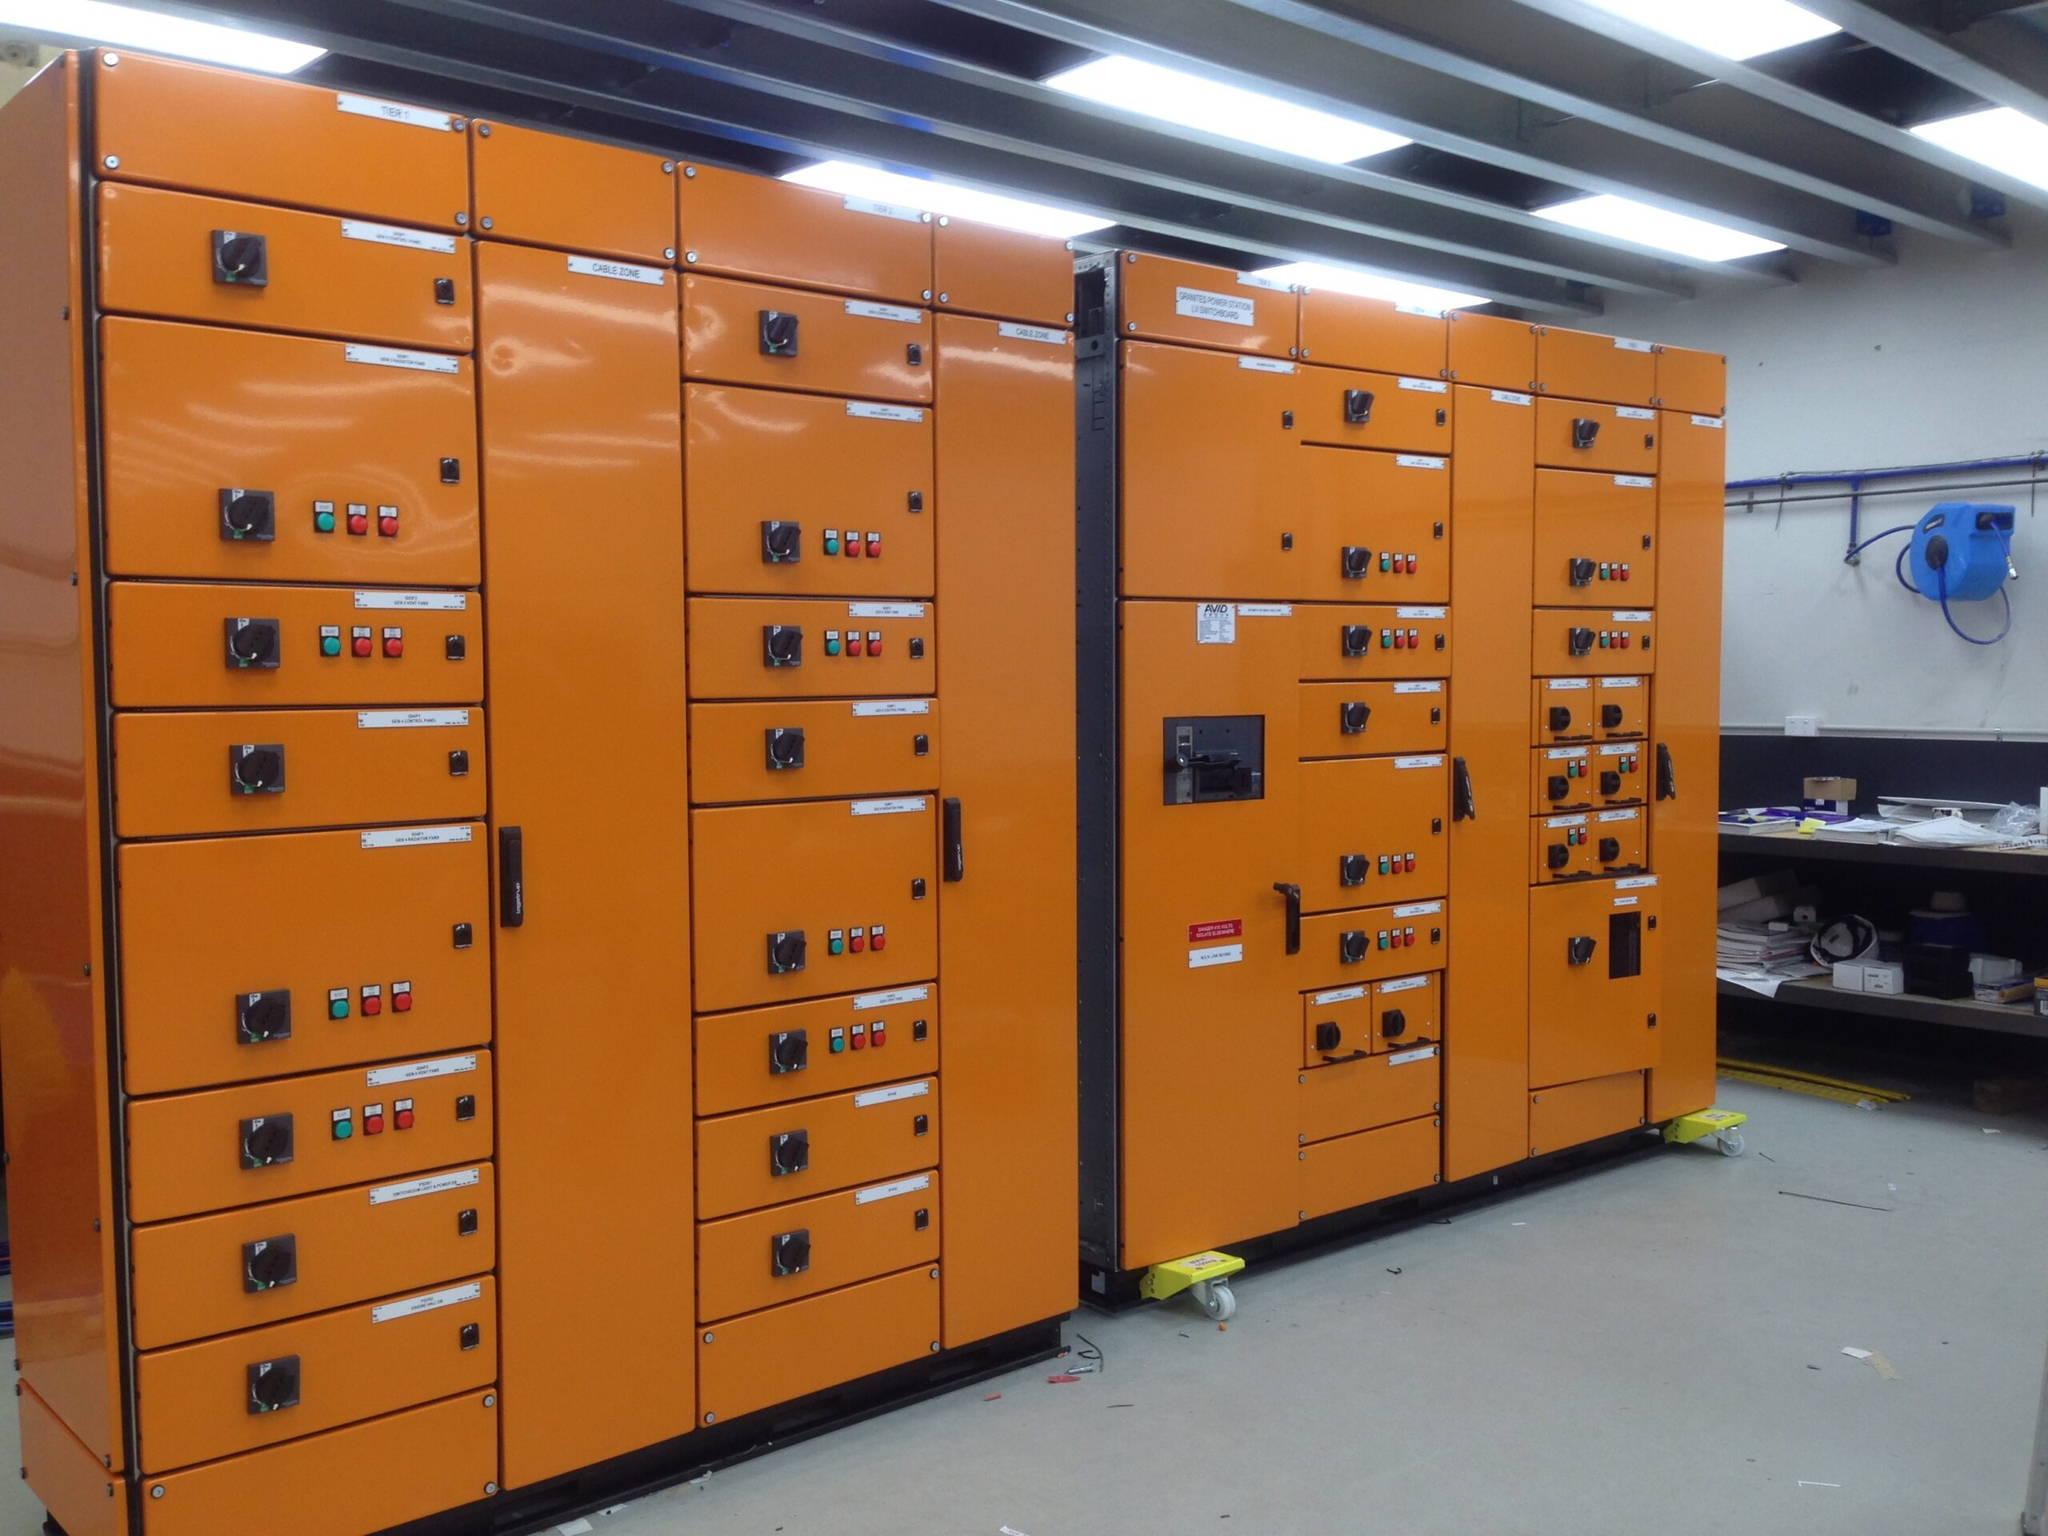 Logstrup Switchboard and Switchgear